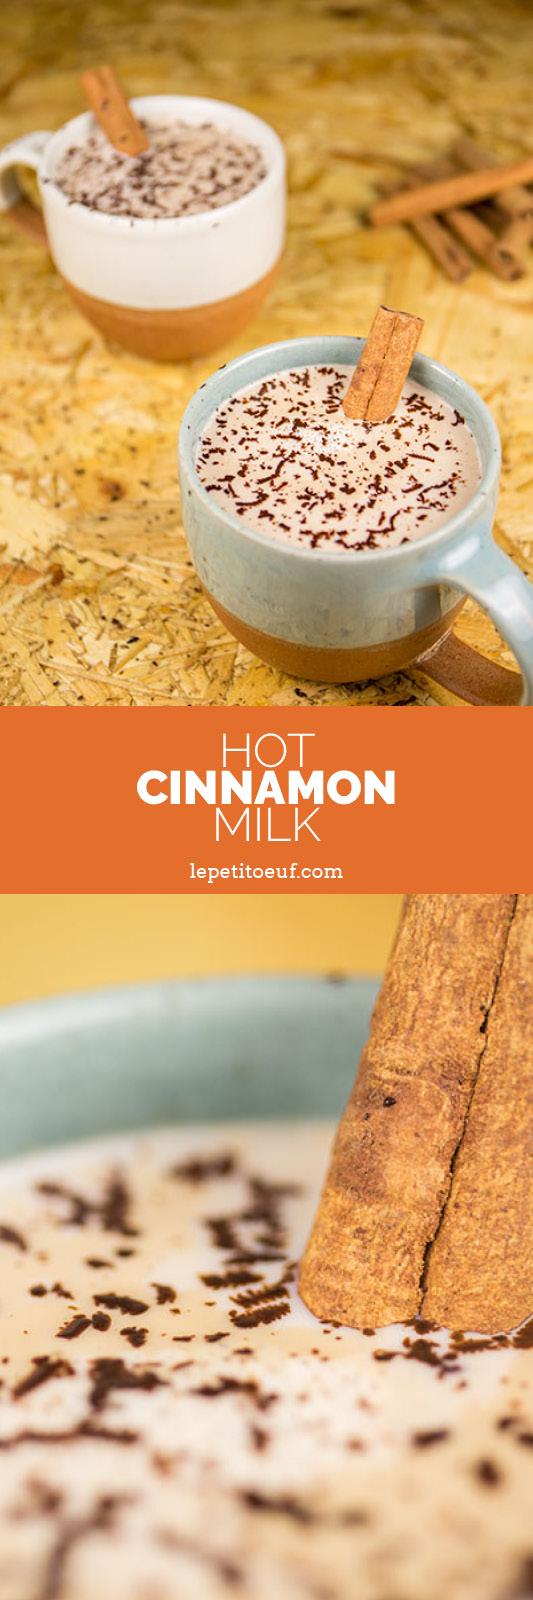 hot cinnamon milk